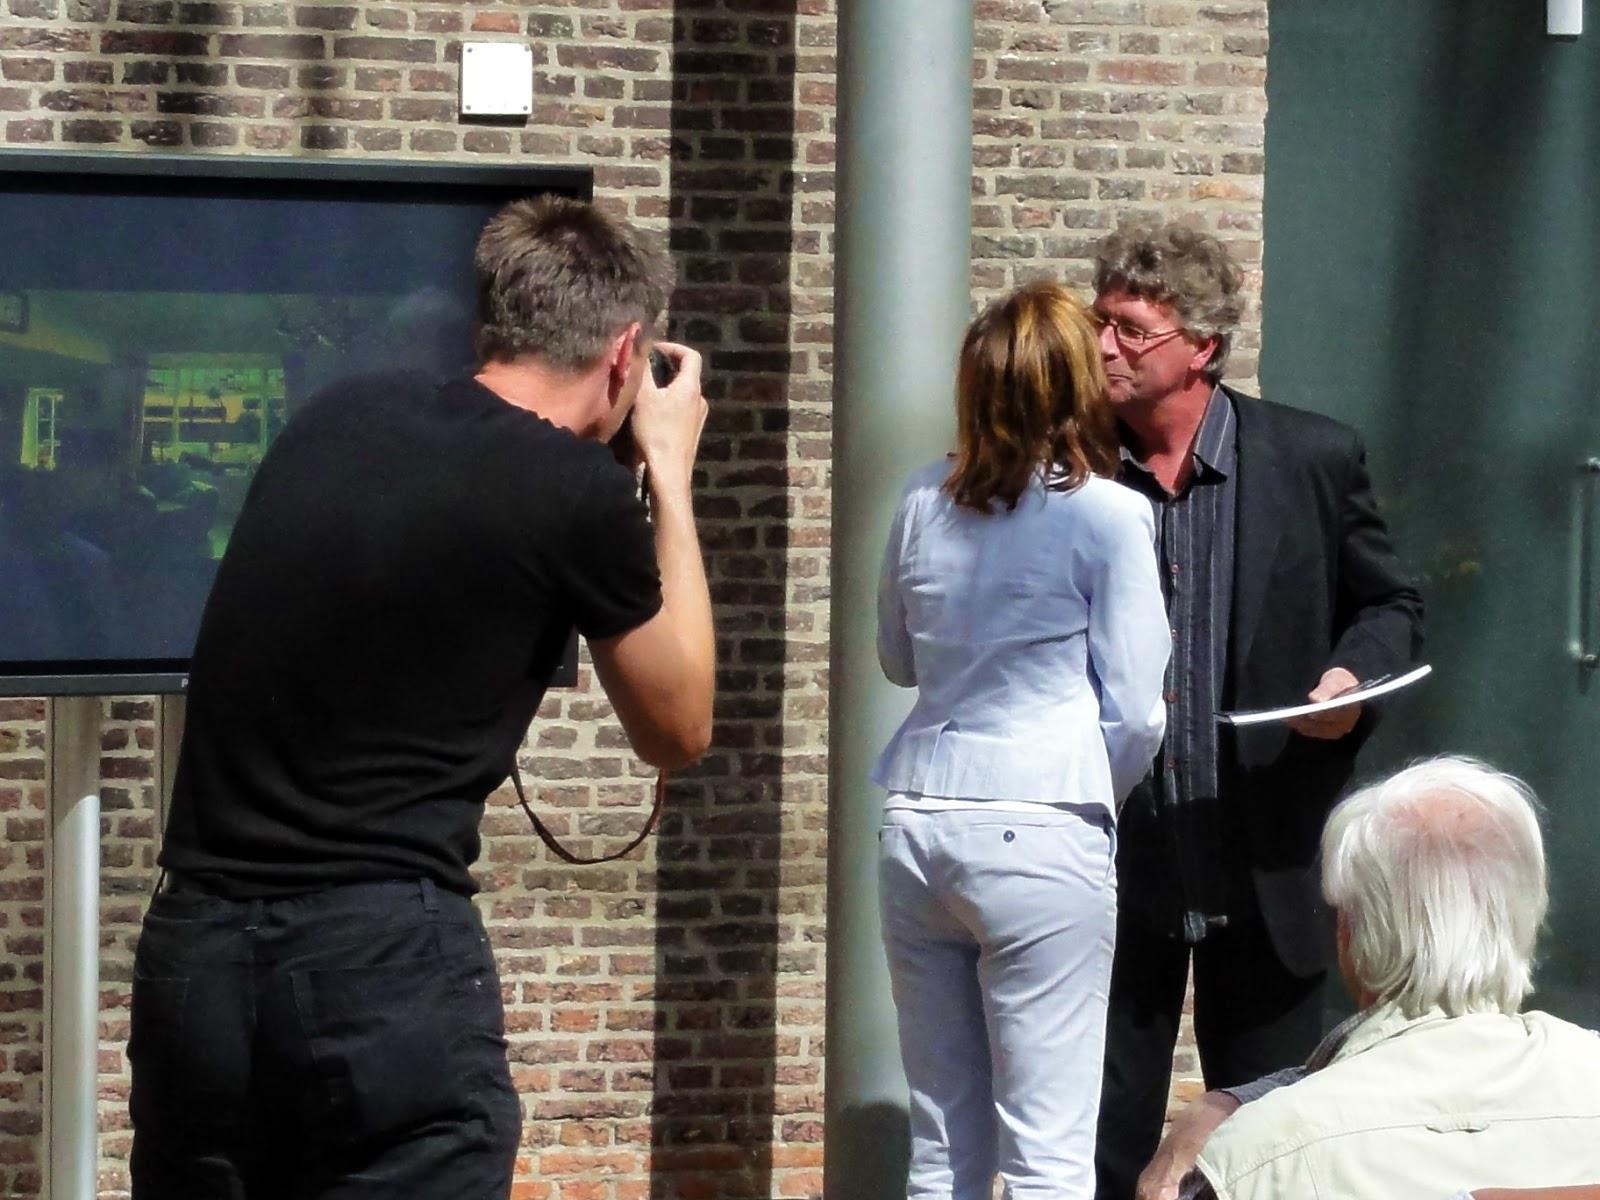 goed mistressmistress zoenen in Delft